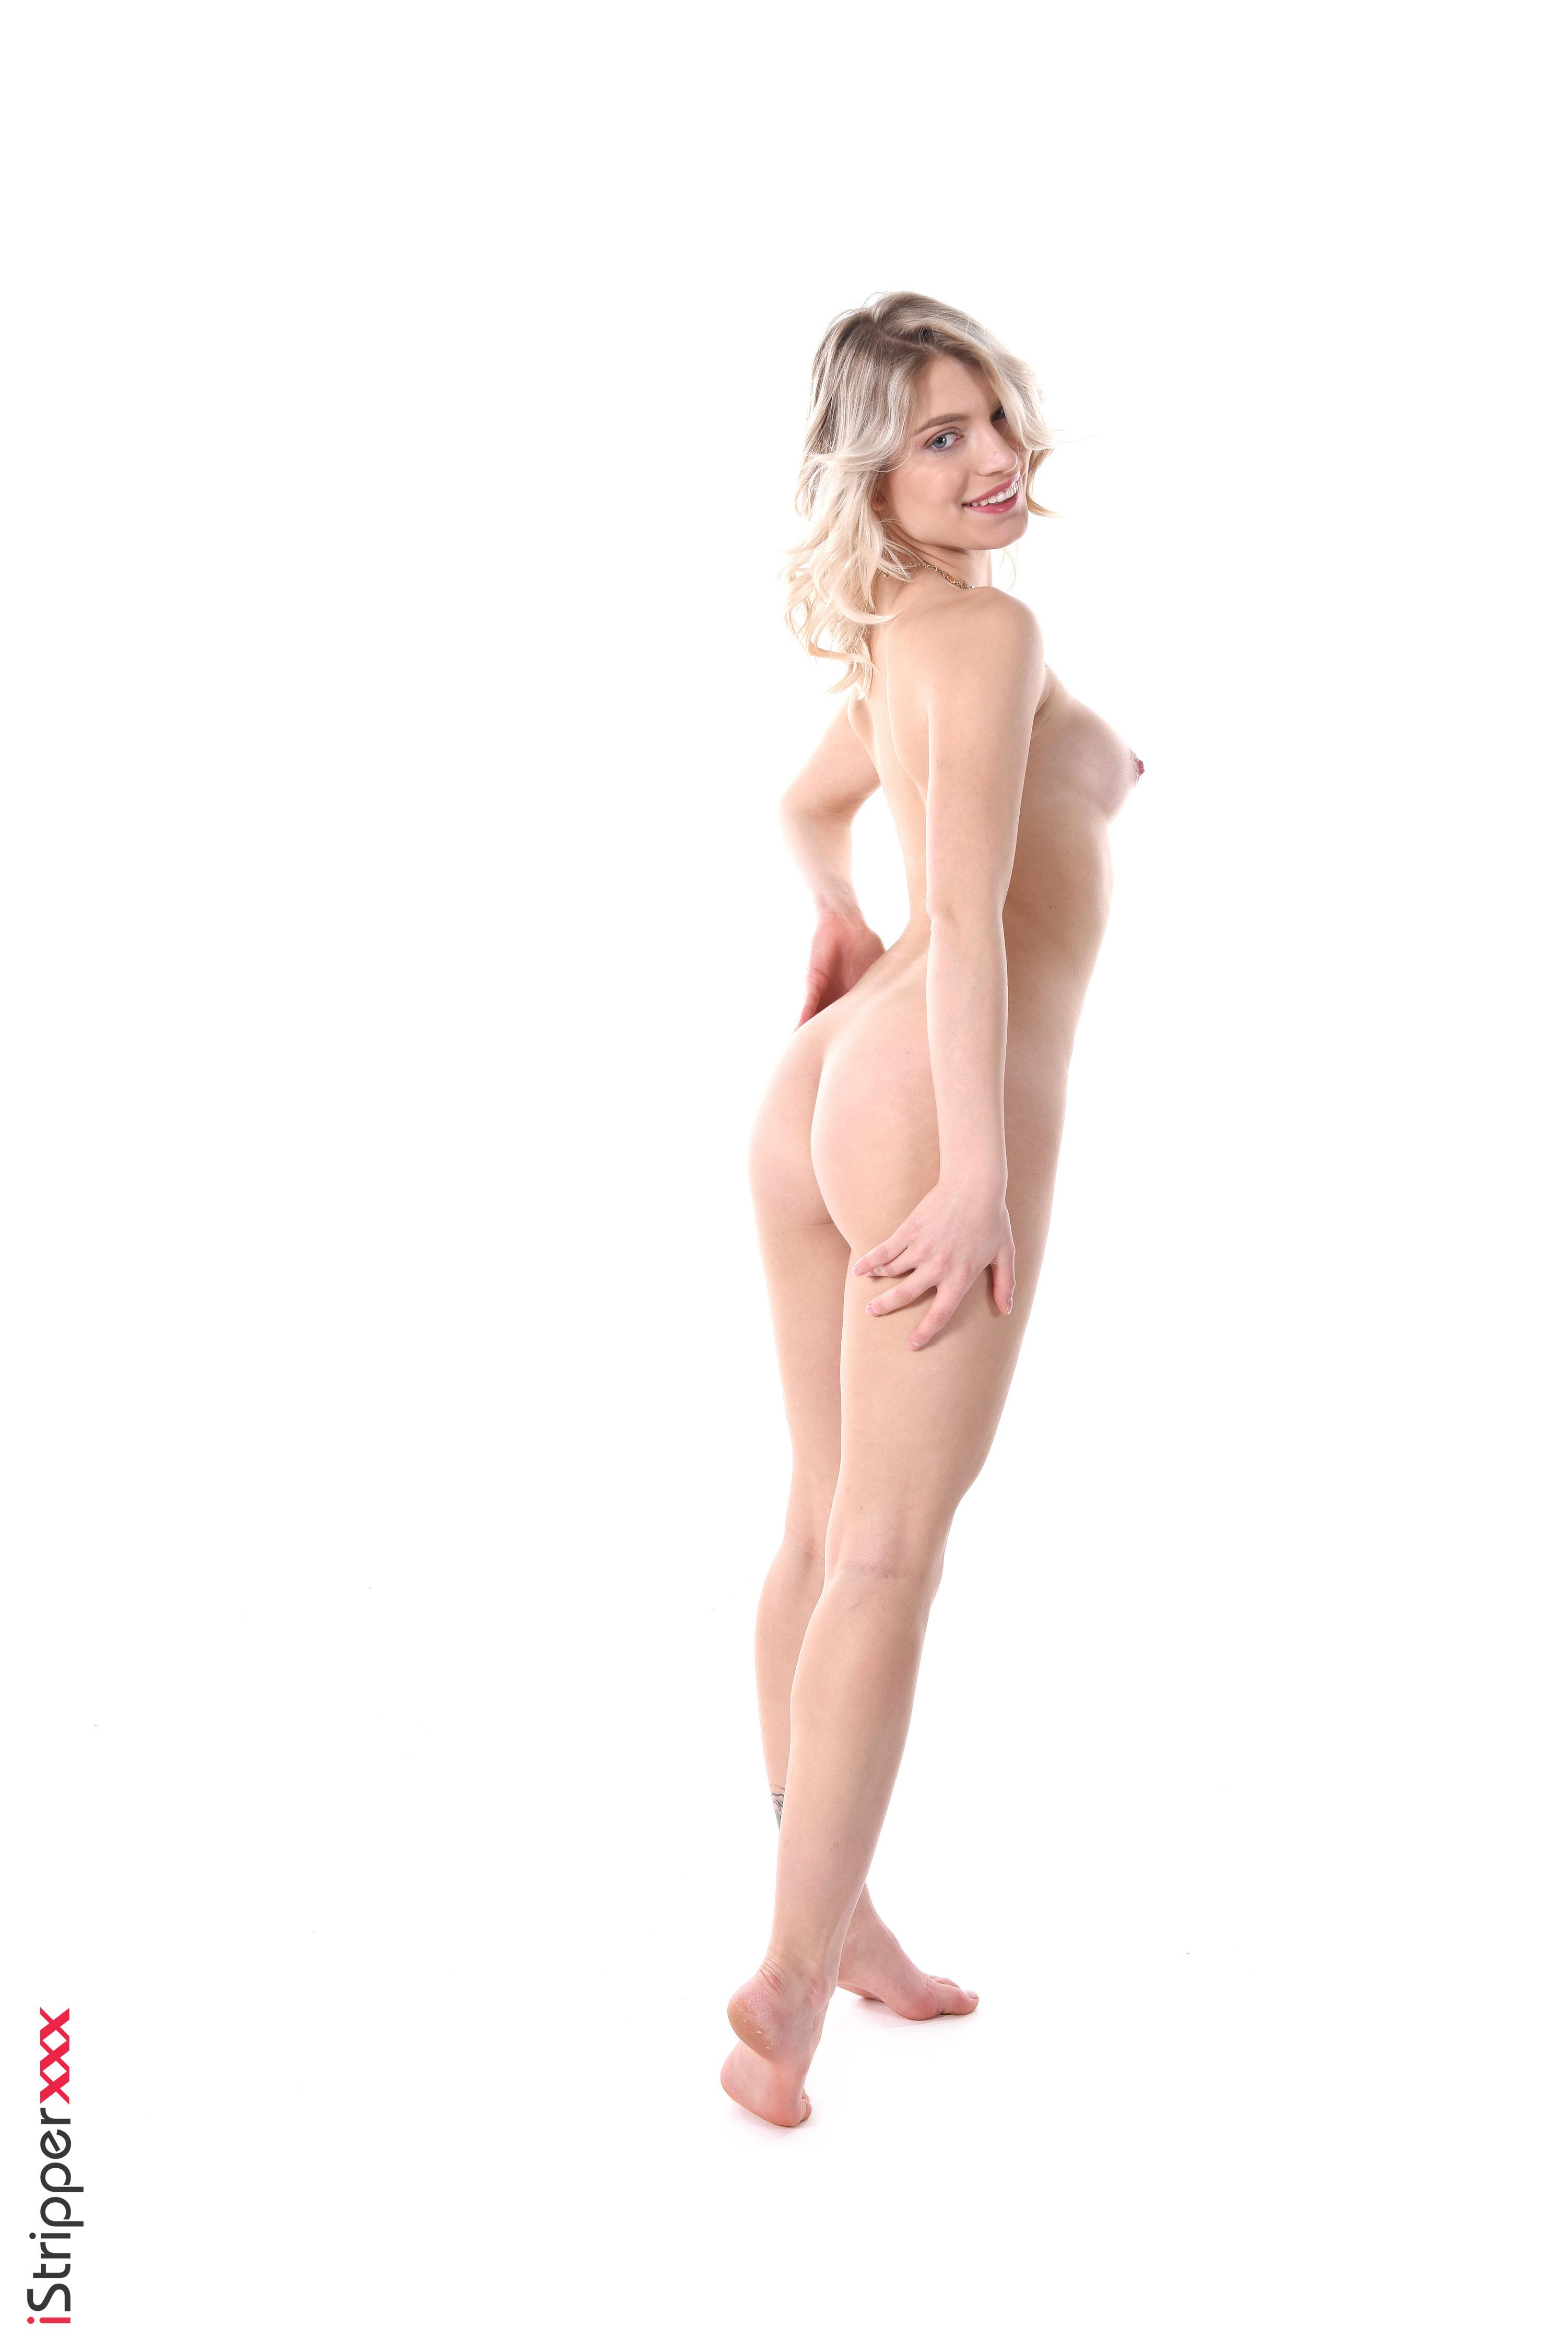 naked backgrounds